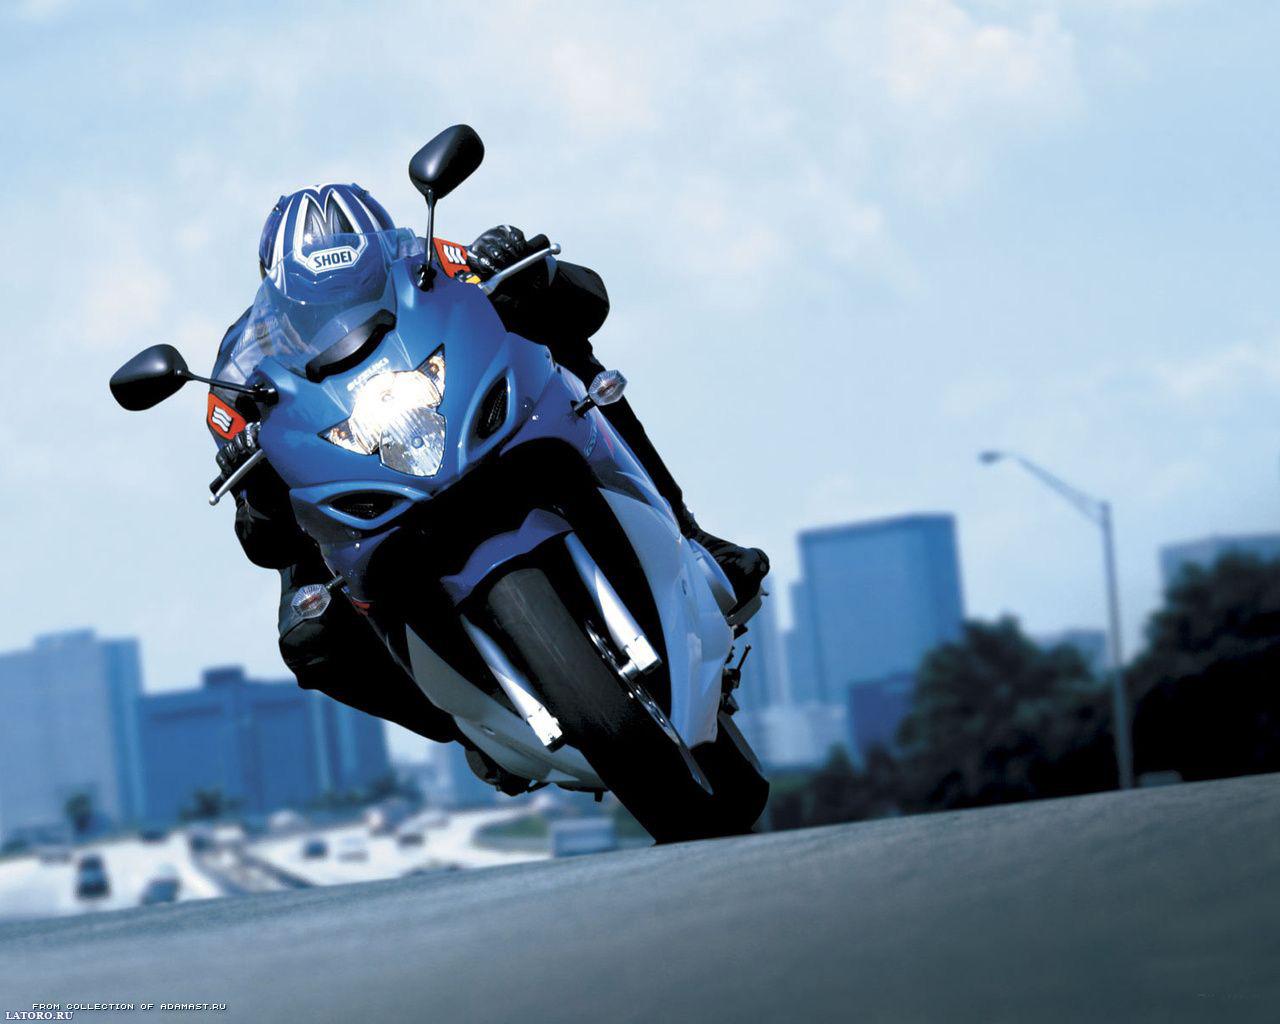 Motorcycle Racing On The Sand Suzuki Hd Desktop Mobile: Motorcycle Wallpaper For Computer